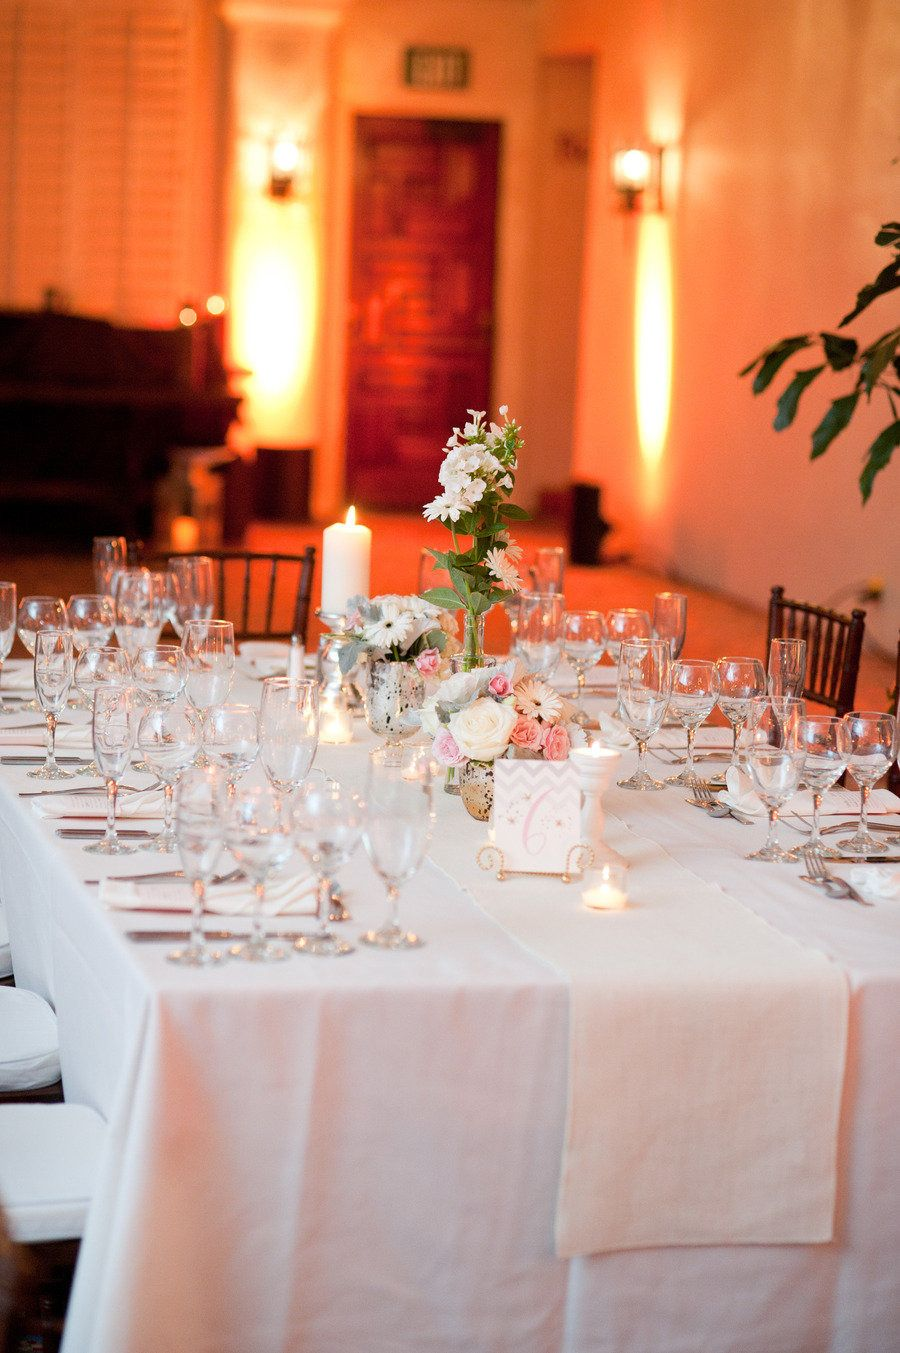 Photography: Candice Benjamin Photography - candicebenjamin.com Event Planning + Design: CCL Weddings - cclweddings.com/ Floral Design: The David Rohr Floral Studio - davidrohrstudio.com  Read More: http://www.stylemepretty.com/california-weddings/palm-springs/2013/04/22/la-quinta-resort-wedding-from-candice-benjamin-photography/